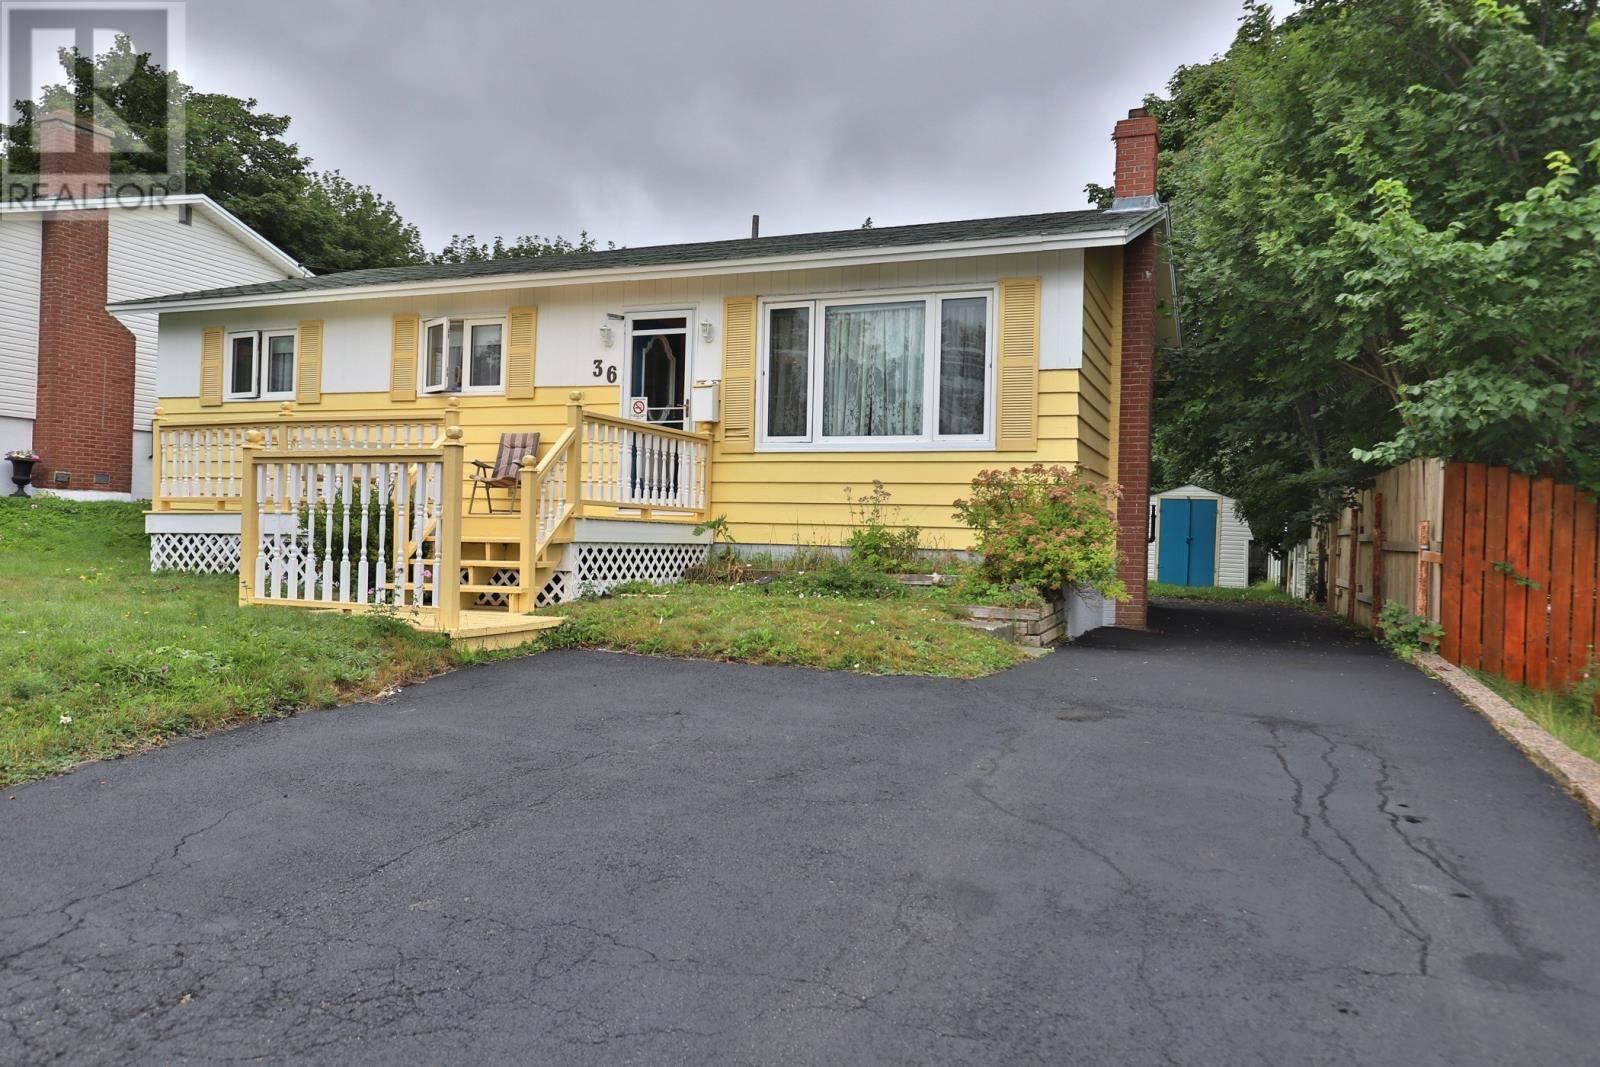 House for sale at 36 Toronto St St. John's Newfoundland - MLS: 1212053